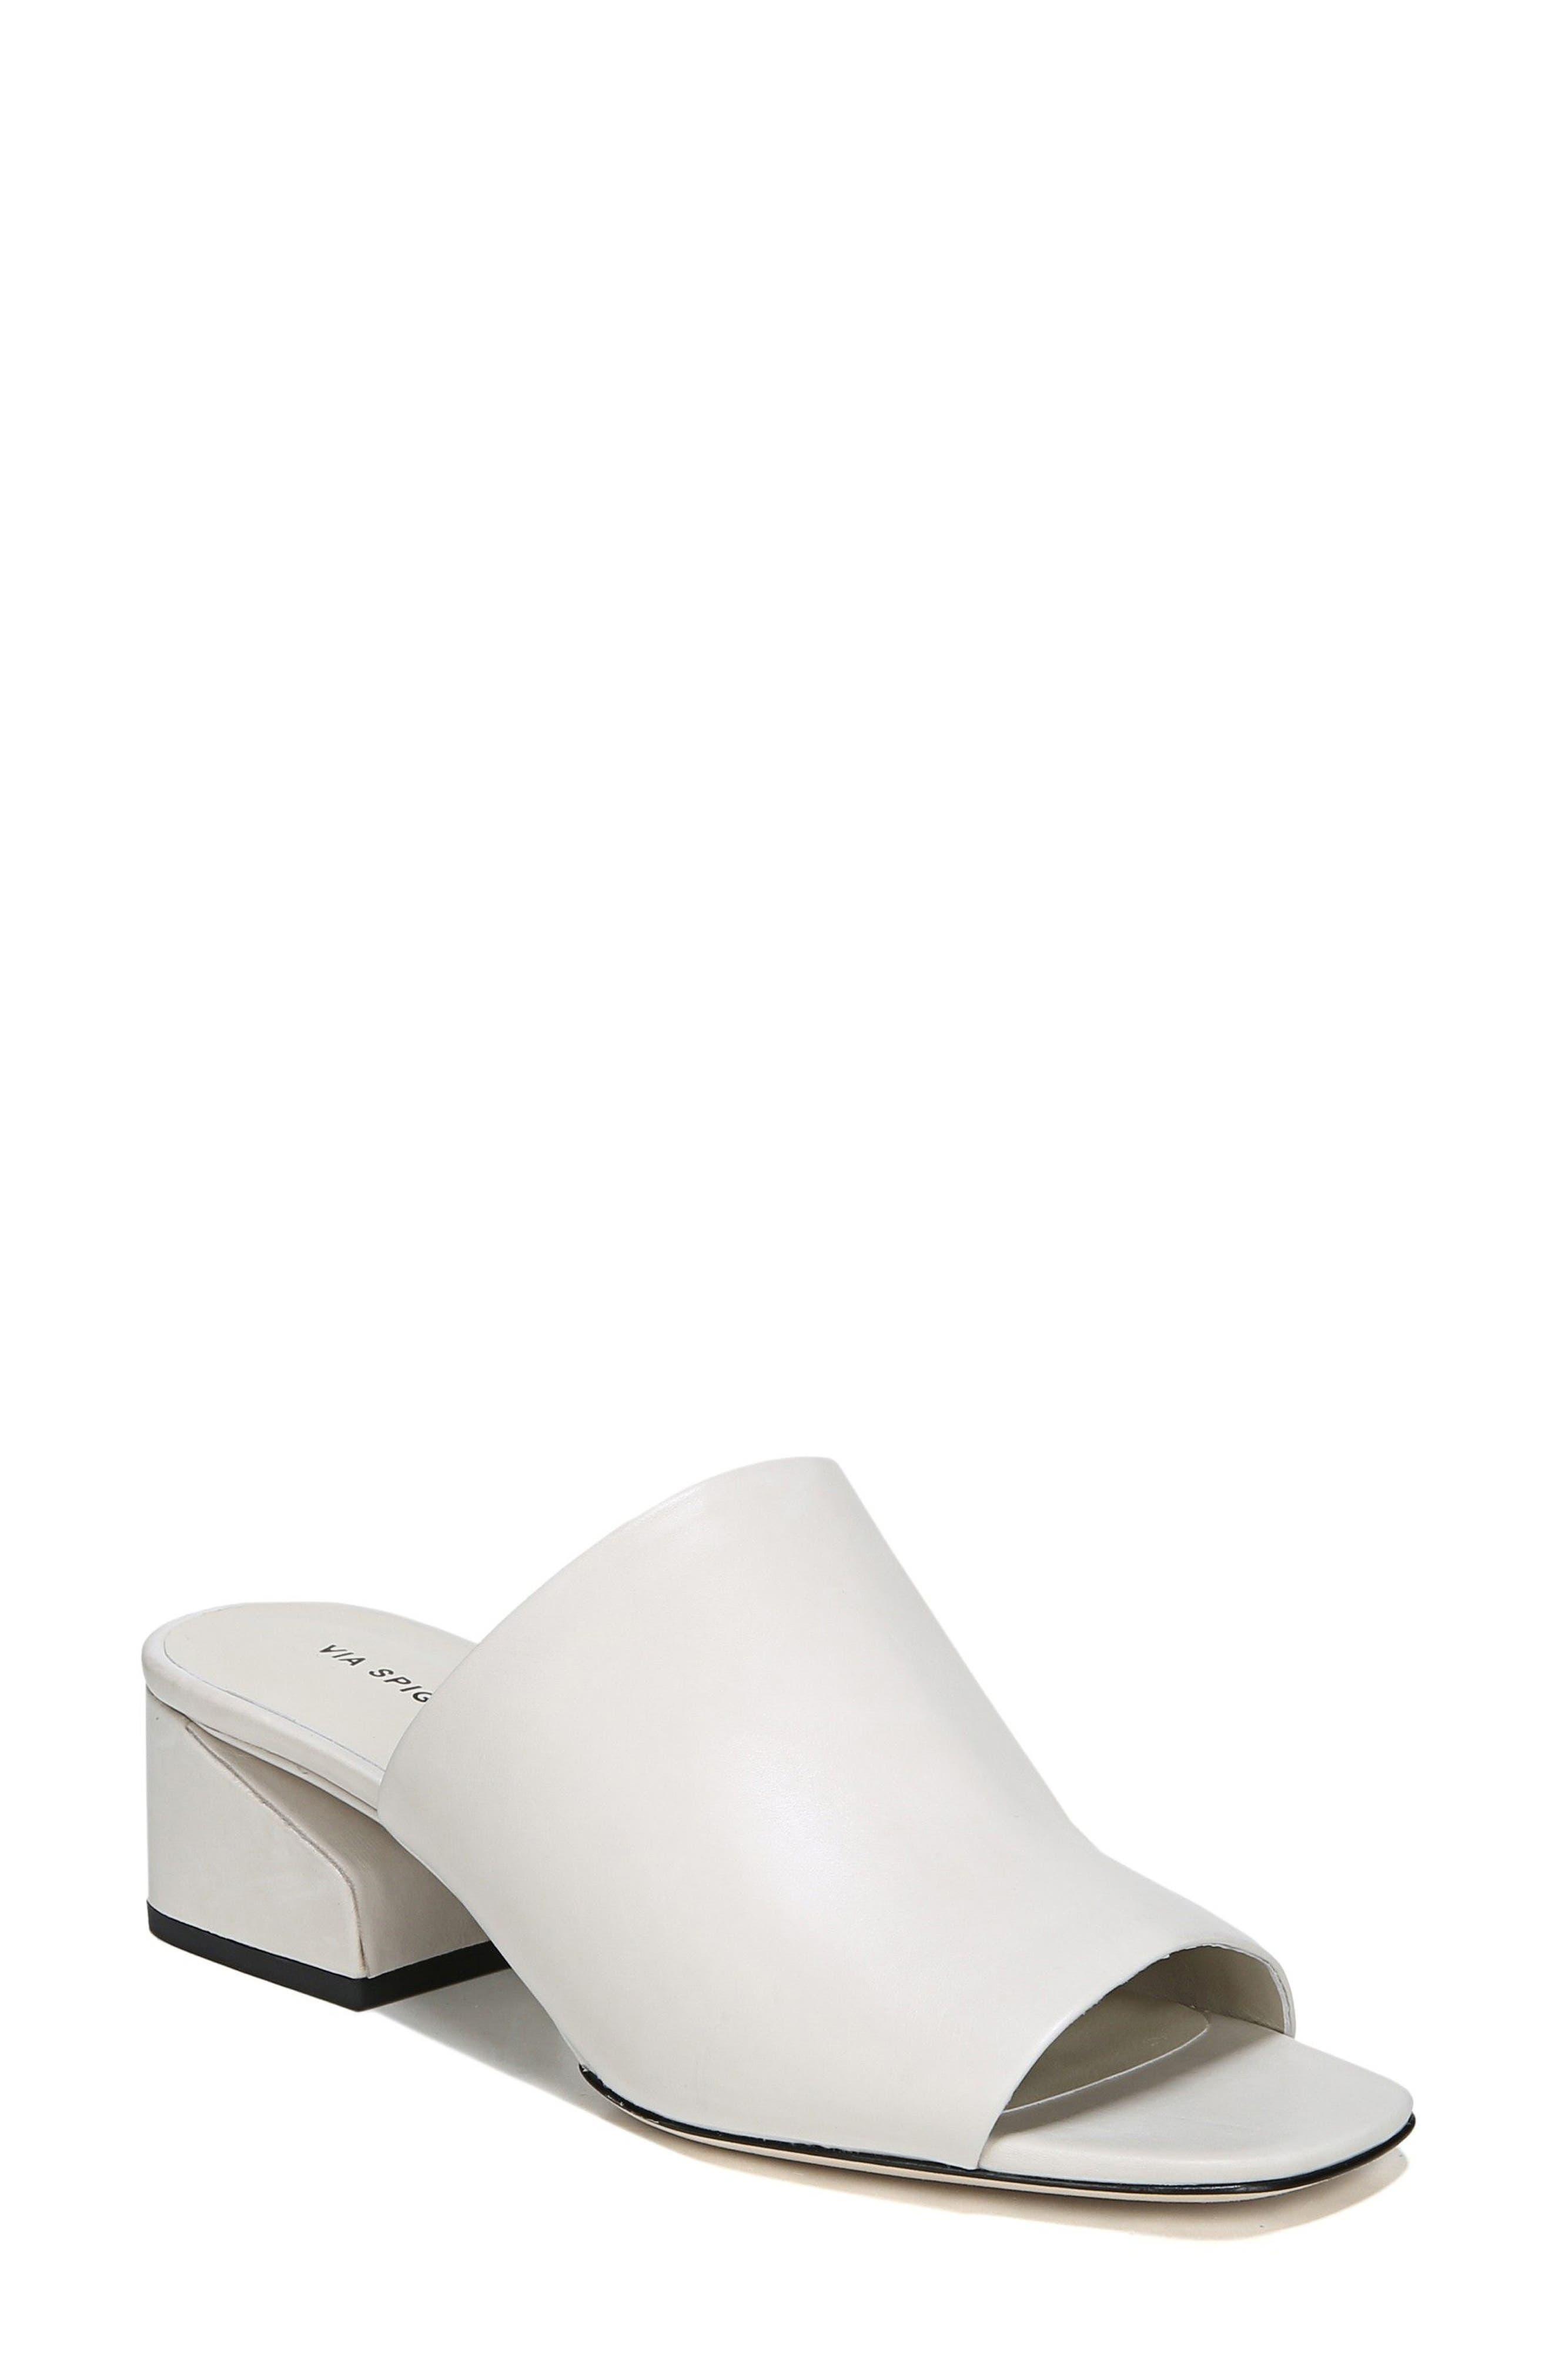 Porter Peep Toe Mule,                         Main,                         color, Bone Leather